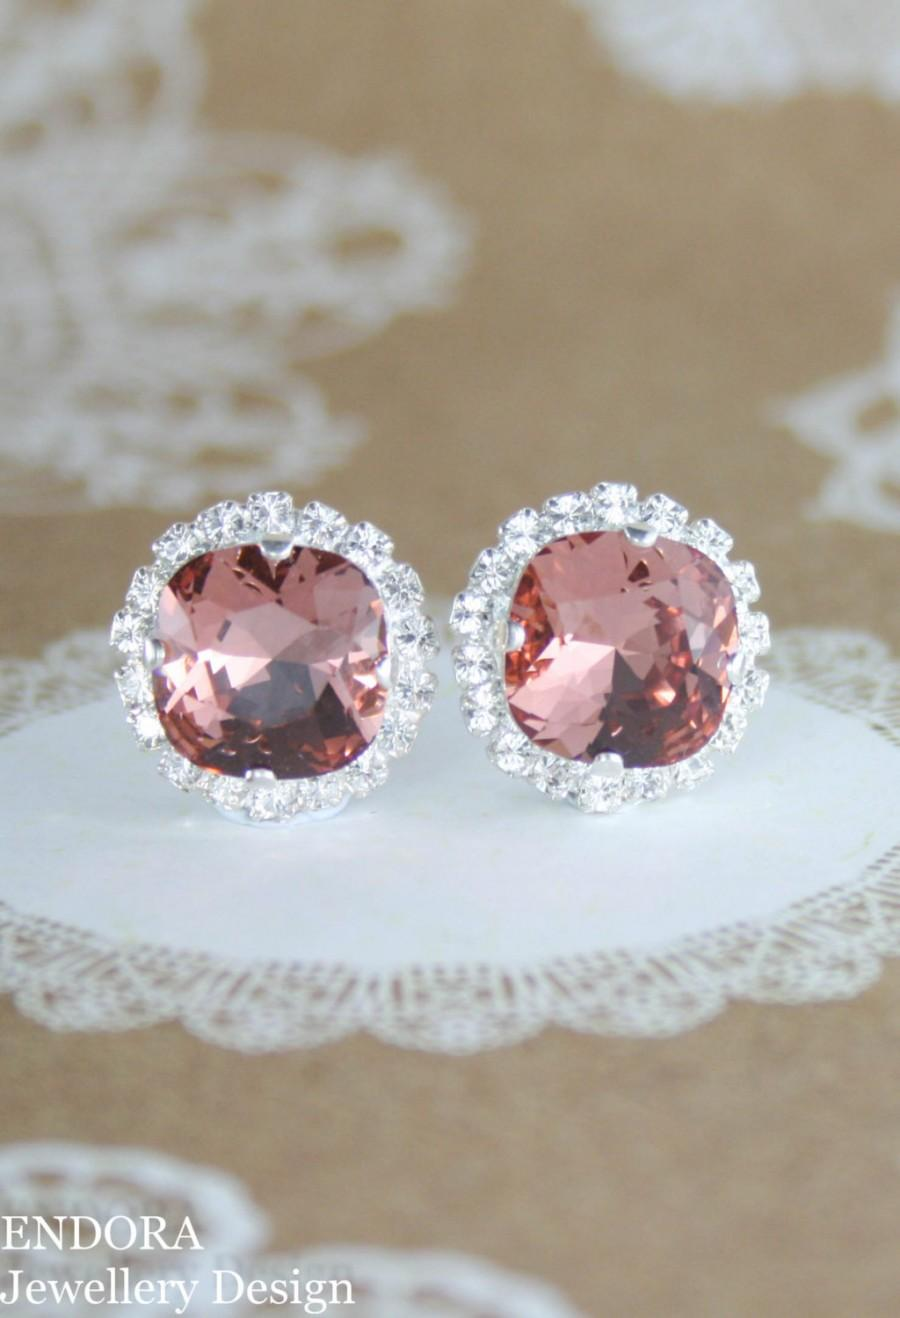 Wedding - Blush earrings,swarovski earrings,swarovski blush rose,bridal earrings,bridesmaid earrings,blush wedding,swarovski,crystal earrings,blush